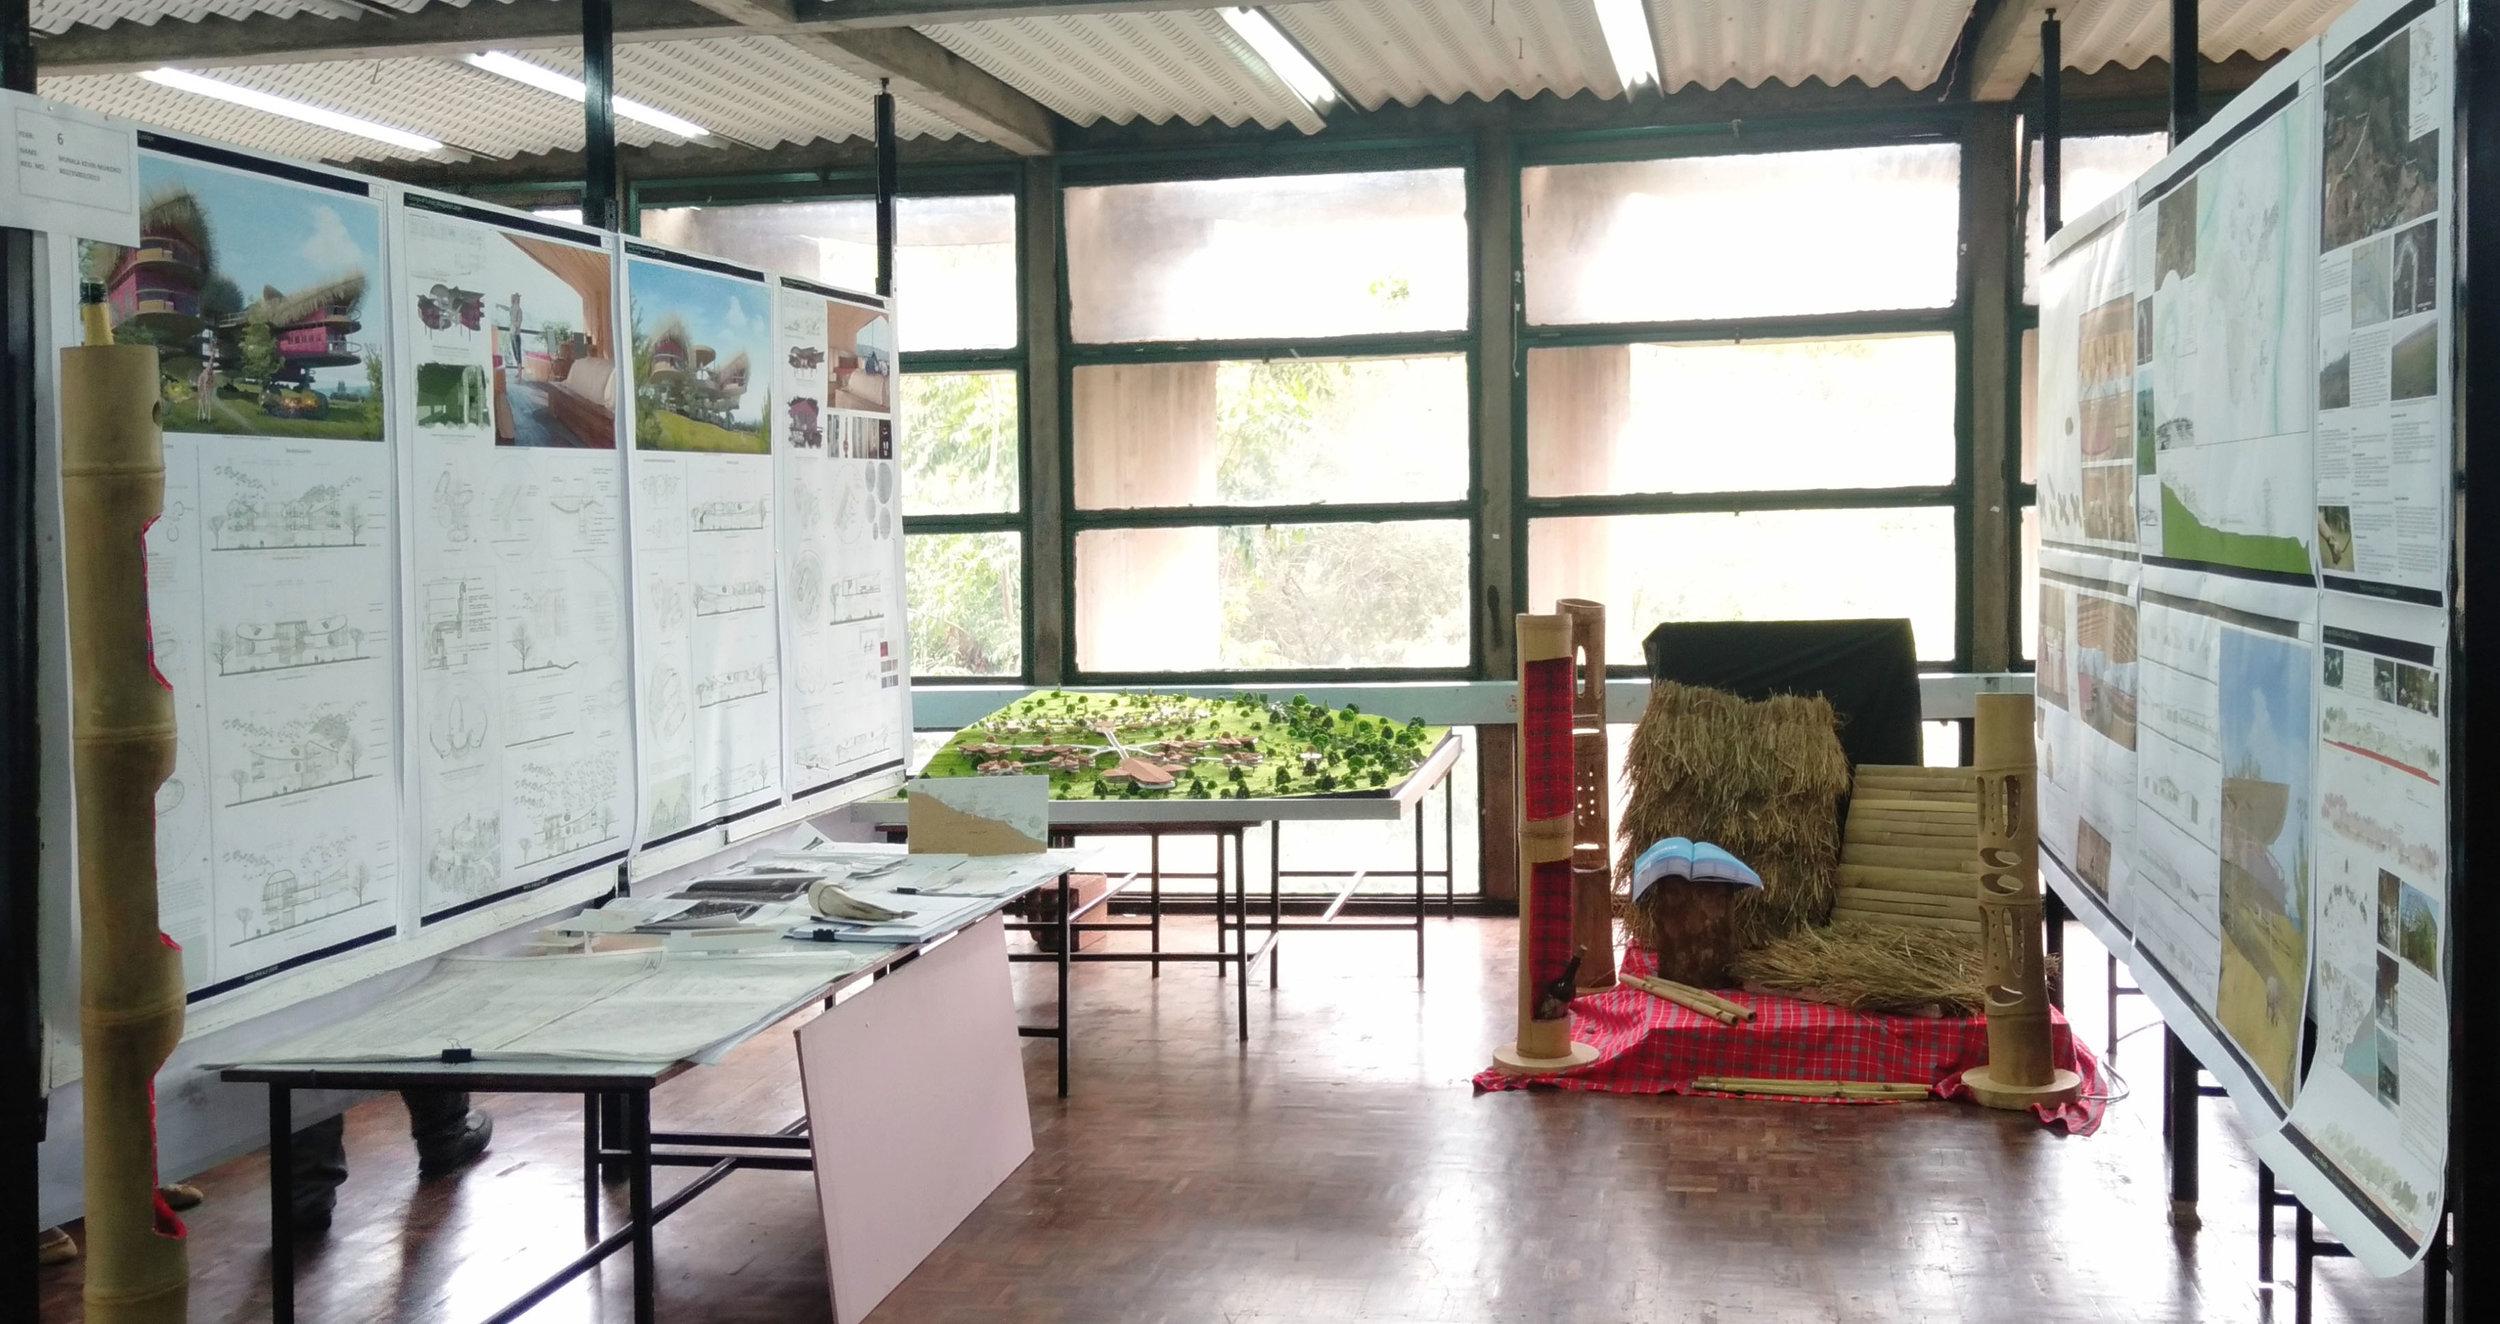 University of Nairobi Exhibition Kevin Munala Carbnstudio Architecture Enkare Mbagathi Lodge Kajiado Nairobi CAA accreditation.jpg